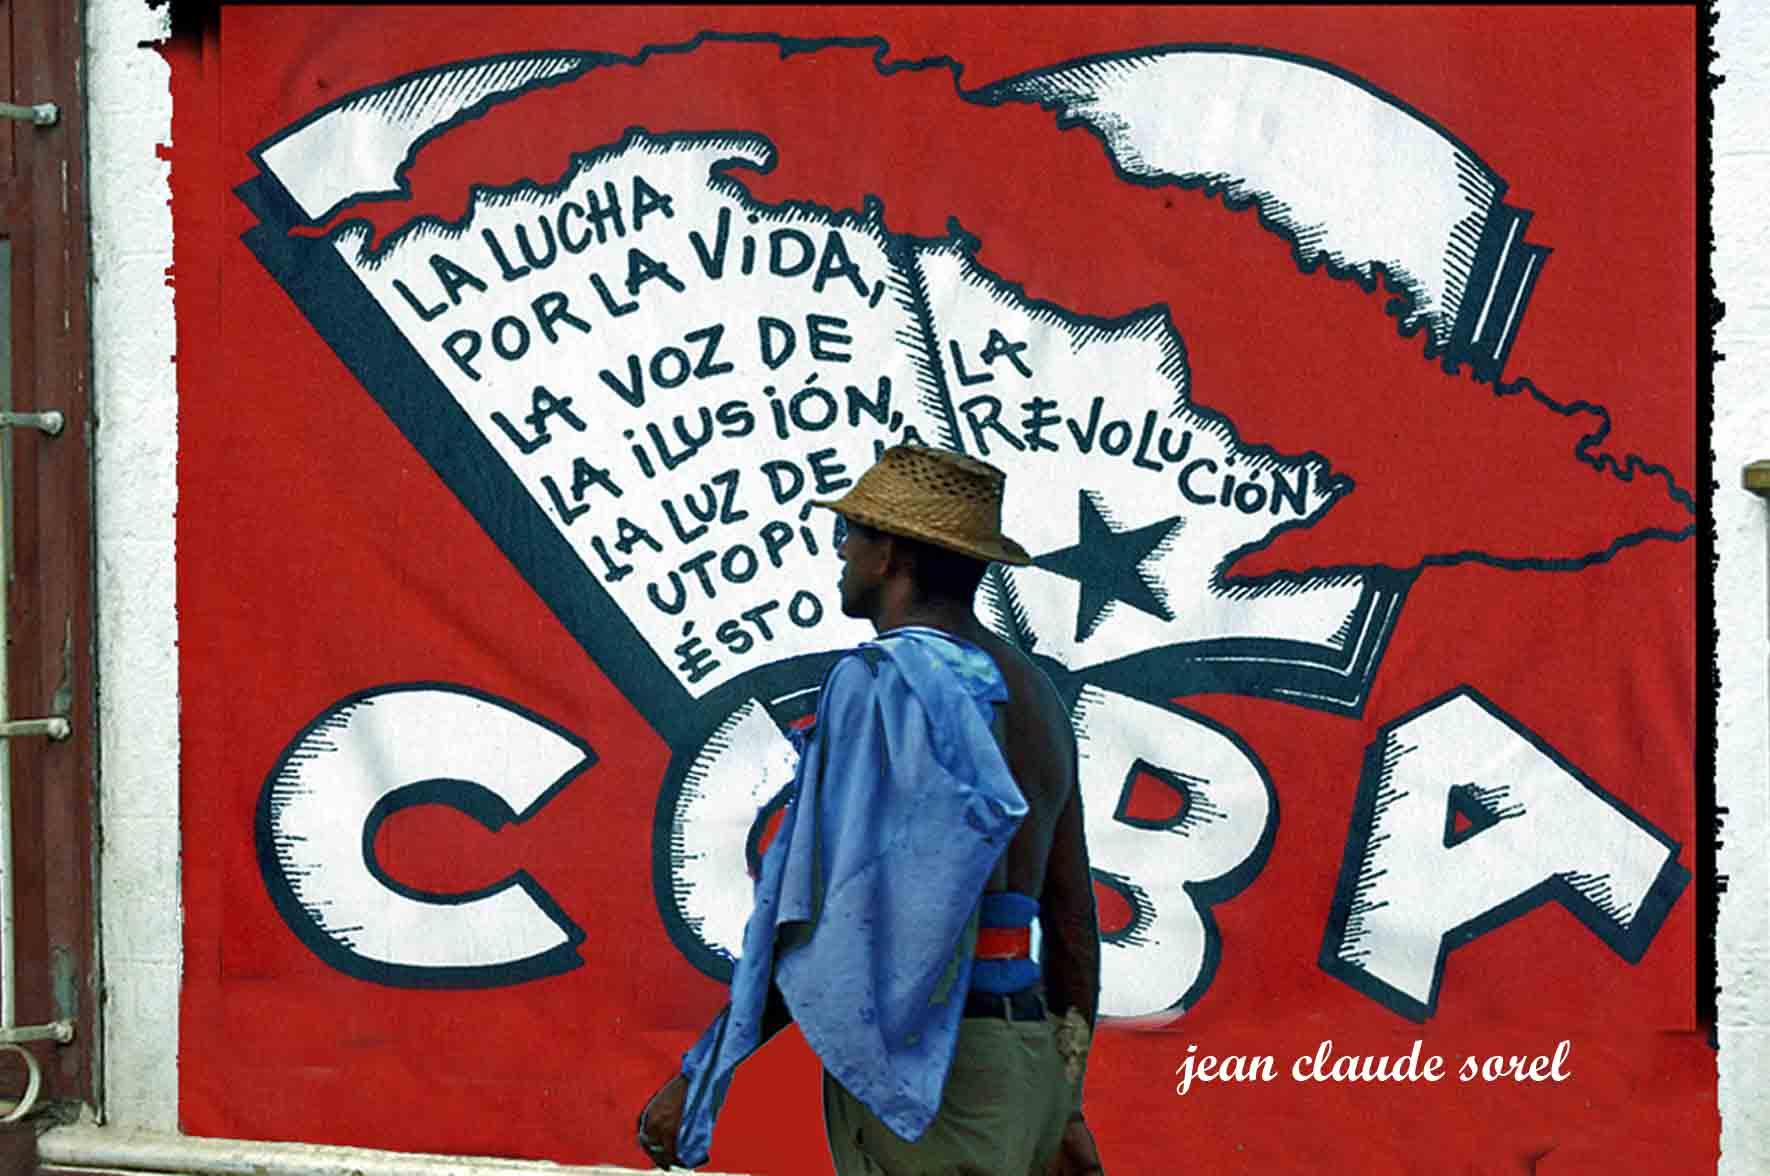 Cuba border=